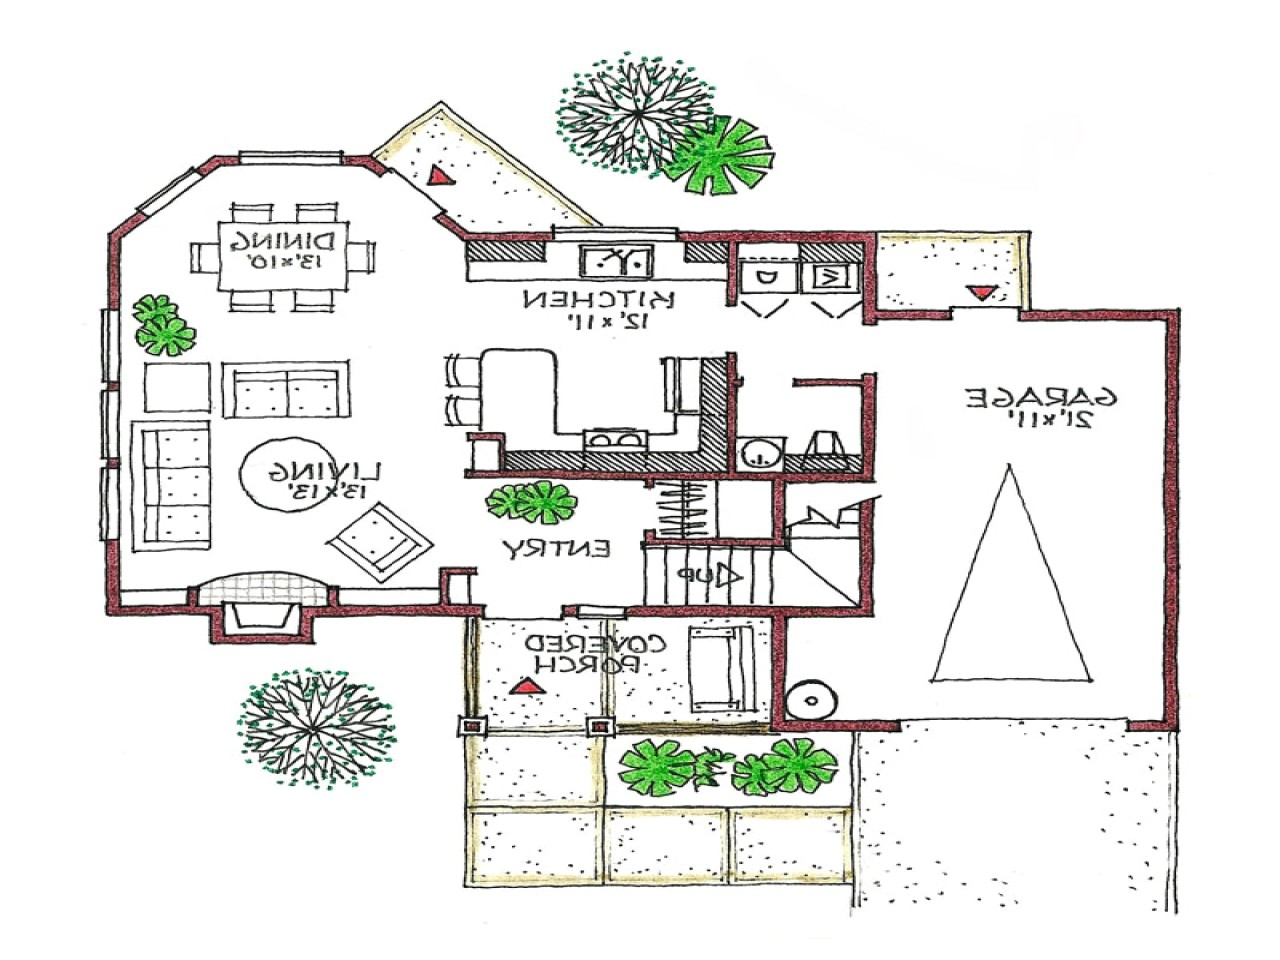 1a68521152df7547 energy efficient house floor plans most energy efficient roof